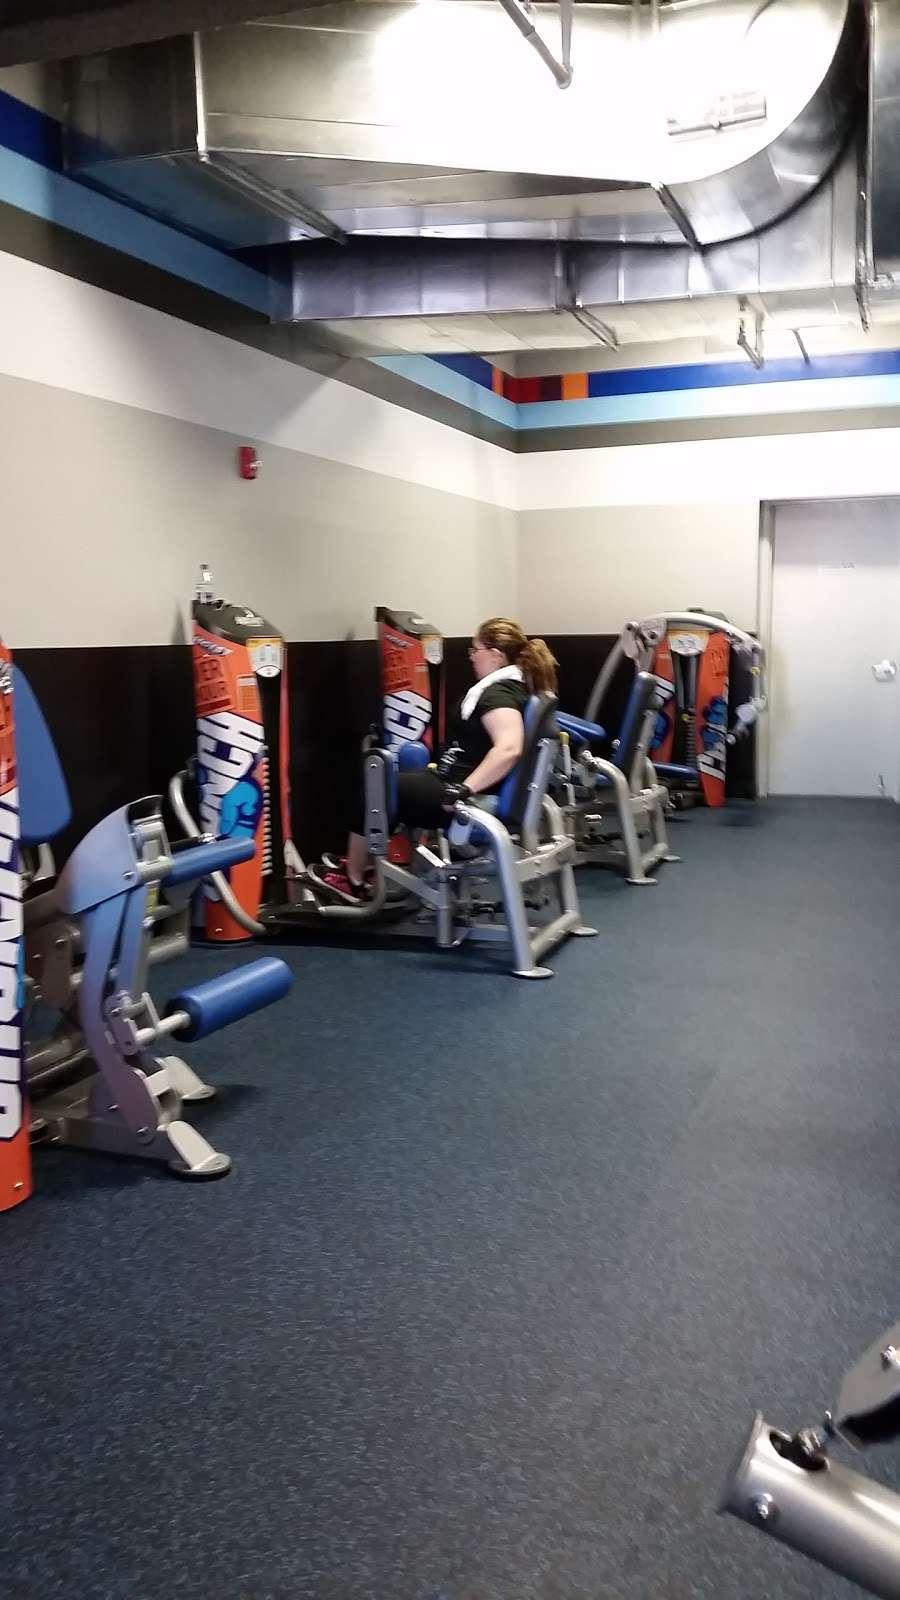 Crunch Fitness - Richmond Hill - gym  | Photo 5 of 10 | Address: 115-02 Jamaica Ave, Richmond Hill, NY 11418, USA | Phone: (646) 780-2050